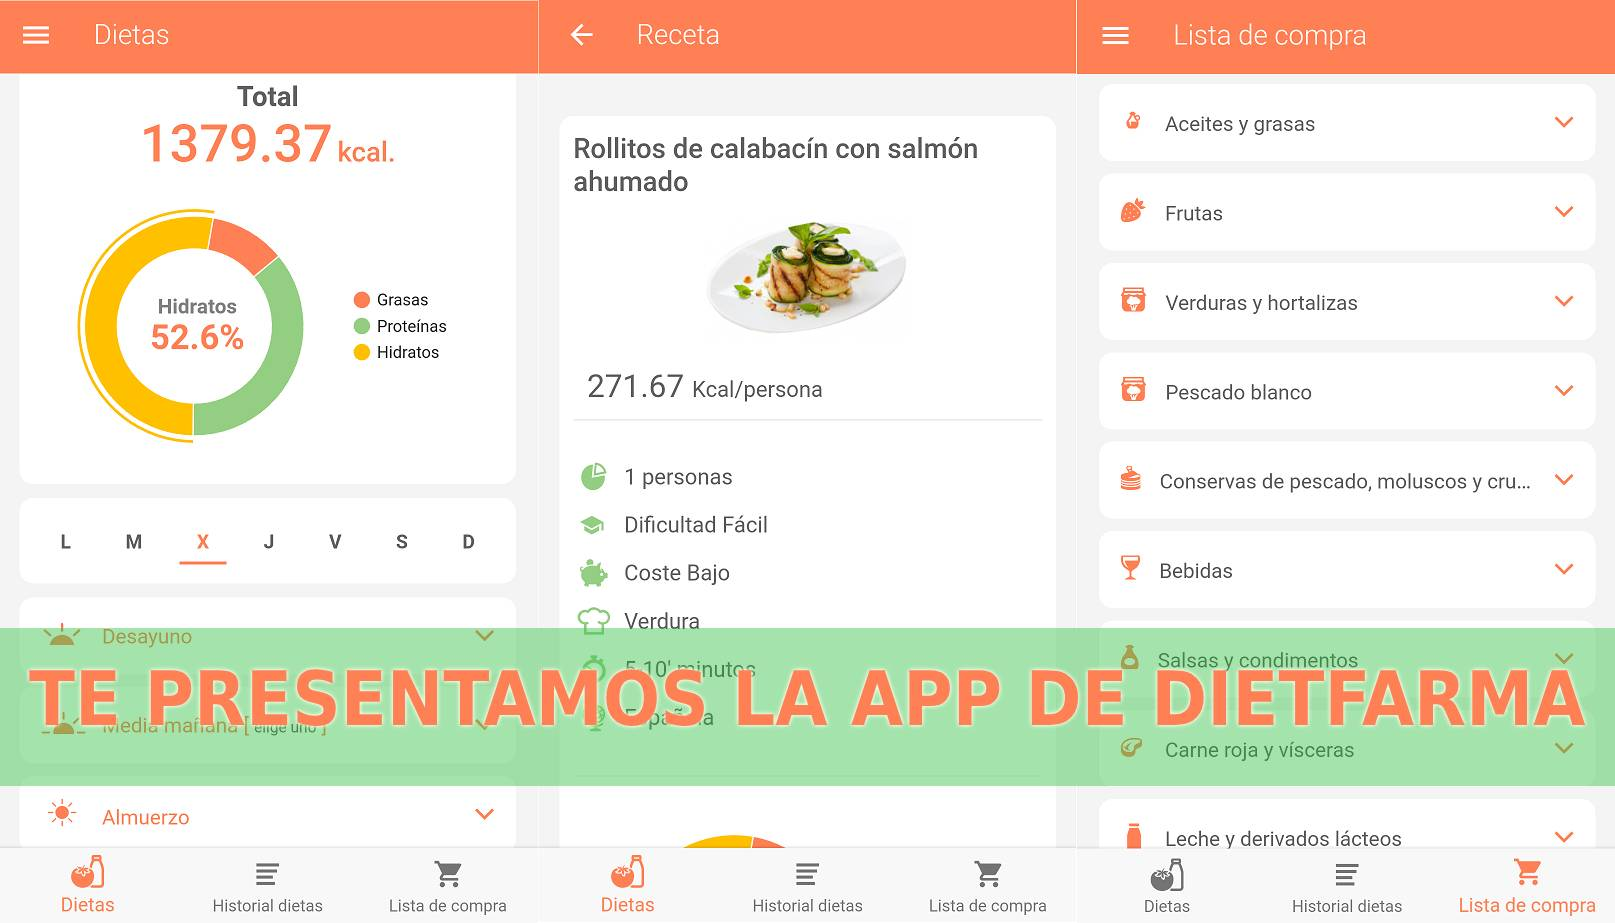 app dietfarma